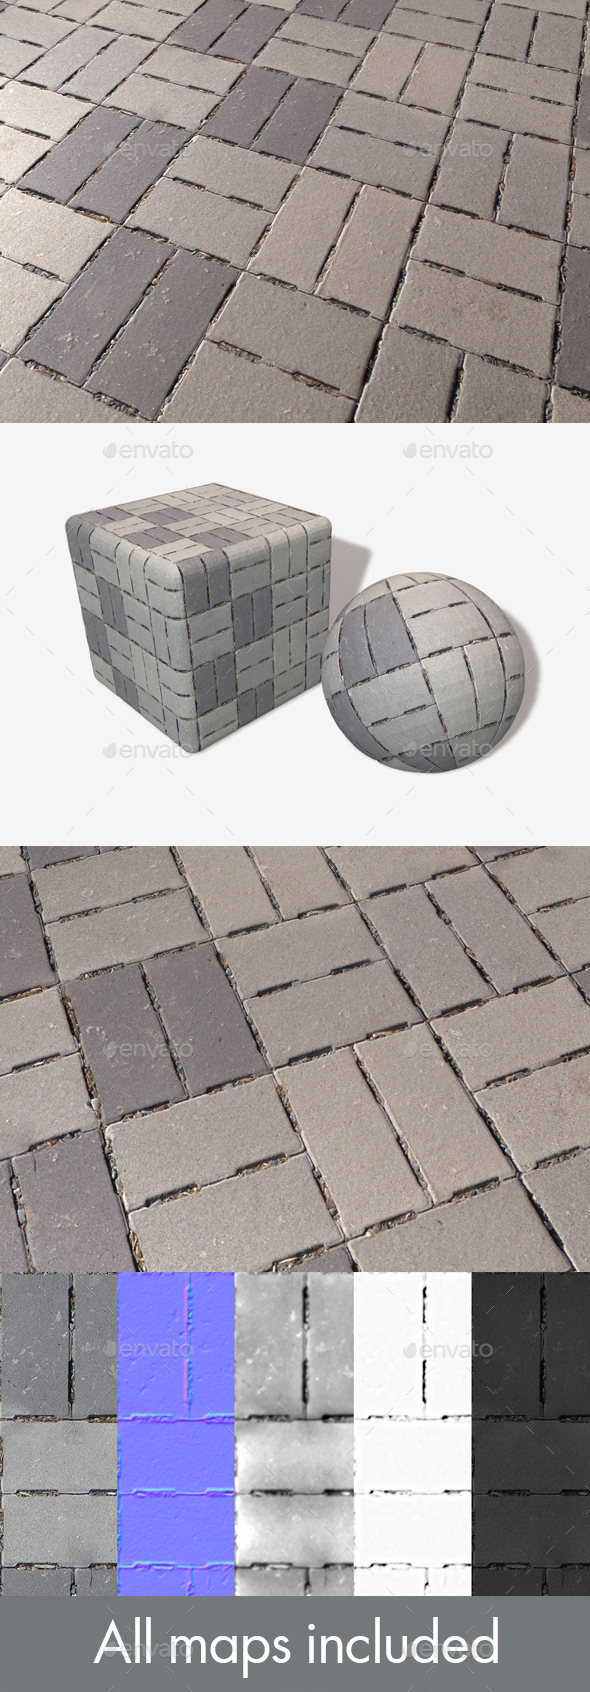 3DOcean Concrete Brick Flooring Seamless Texture 20032499